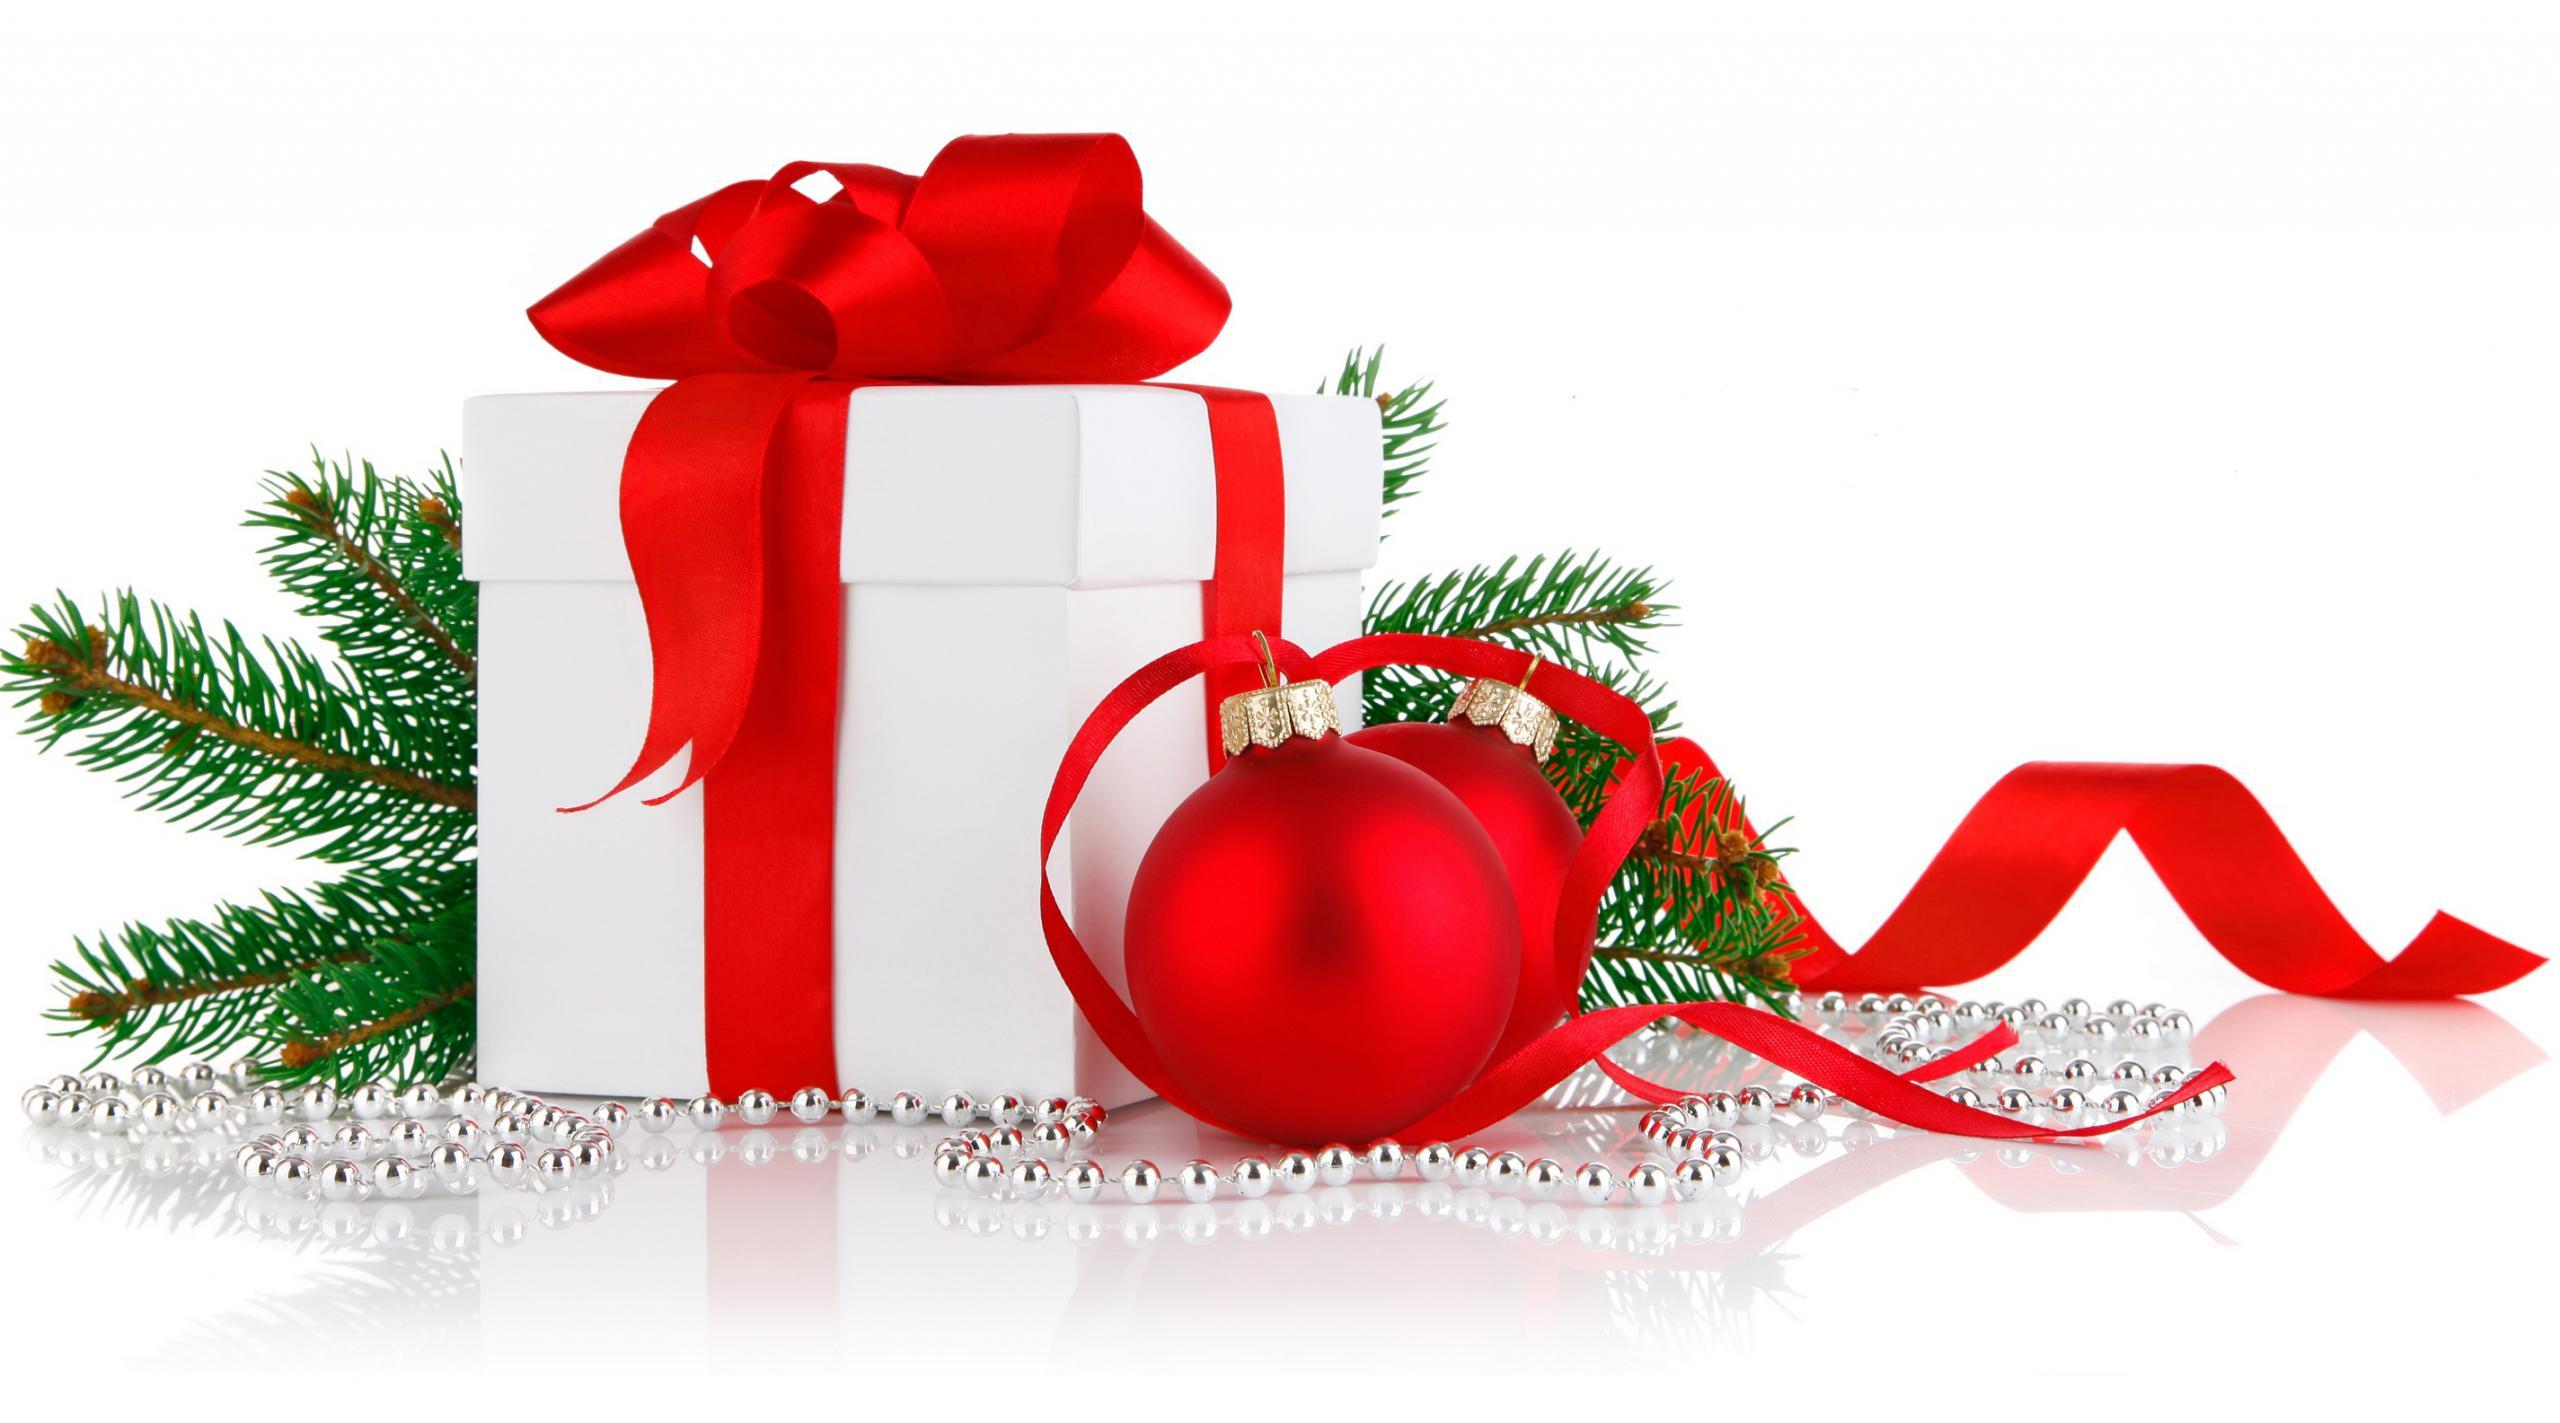 Розыгрыш подарка от Деда Мороза